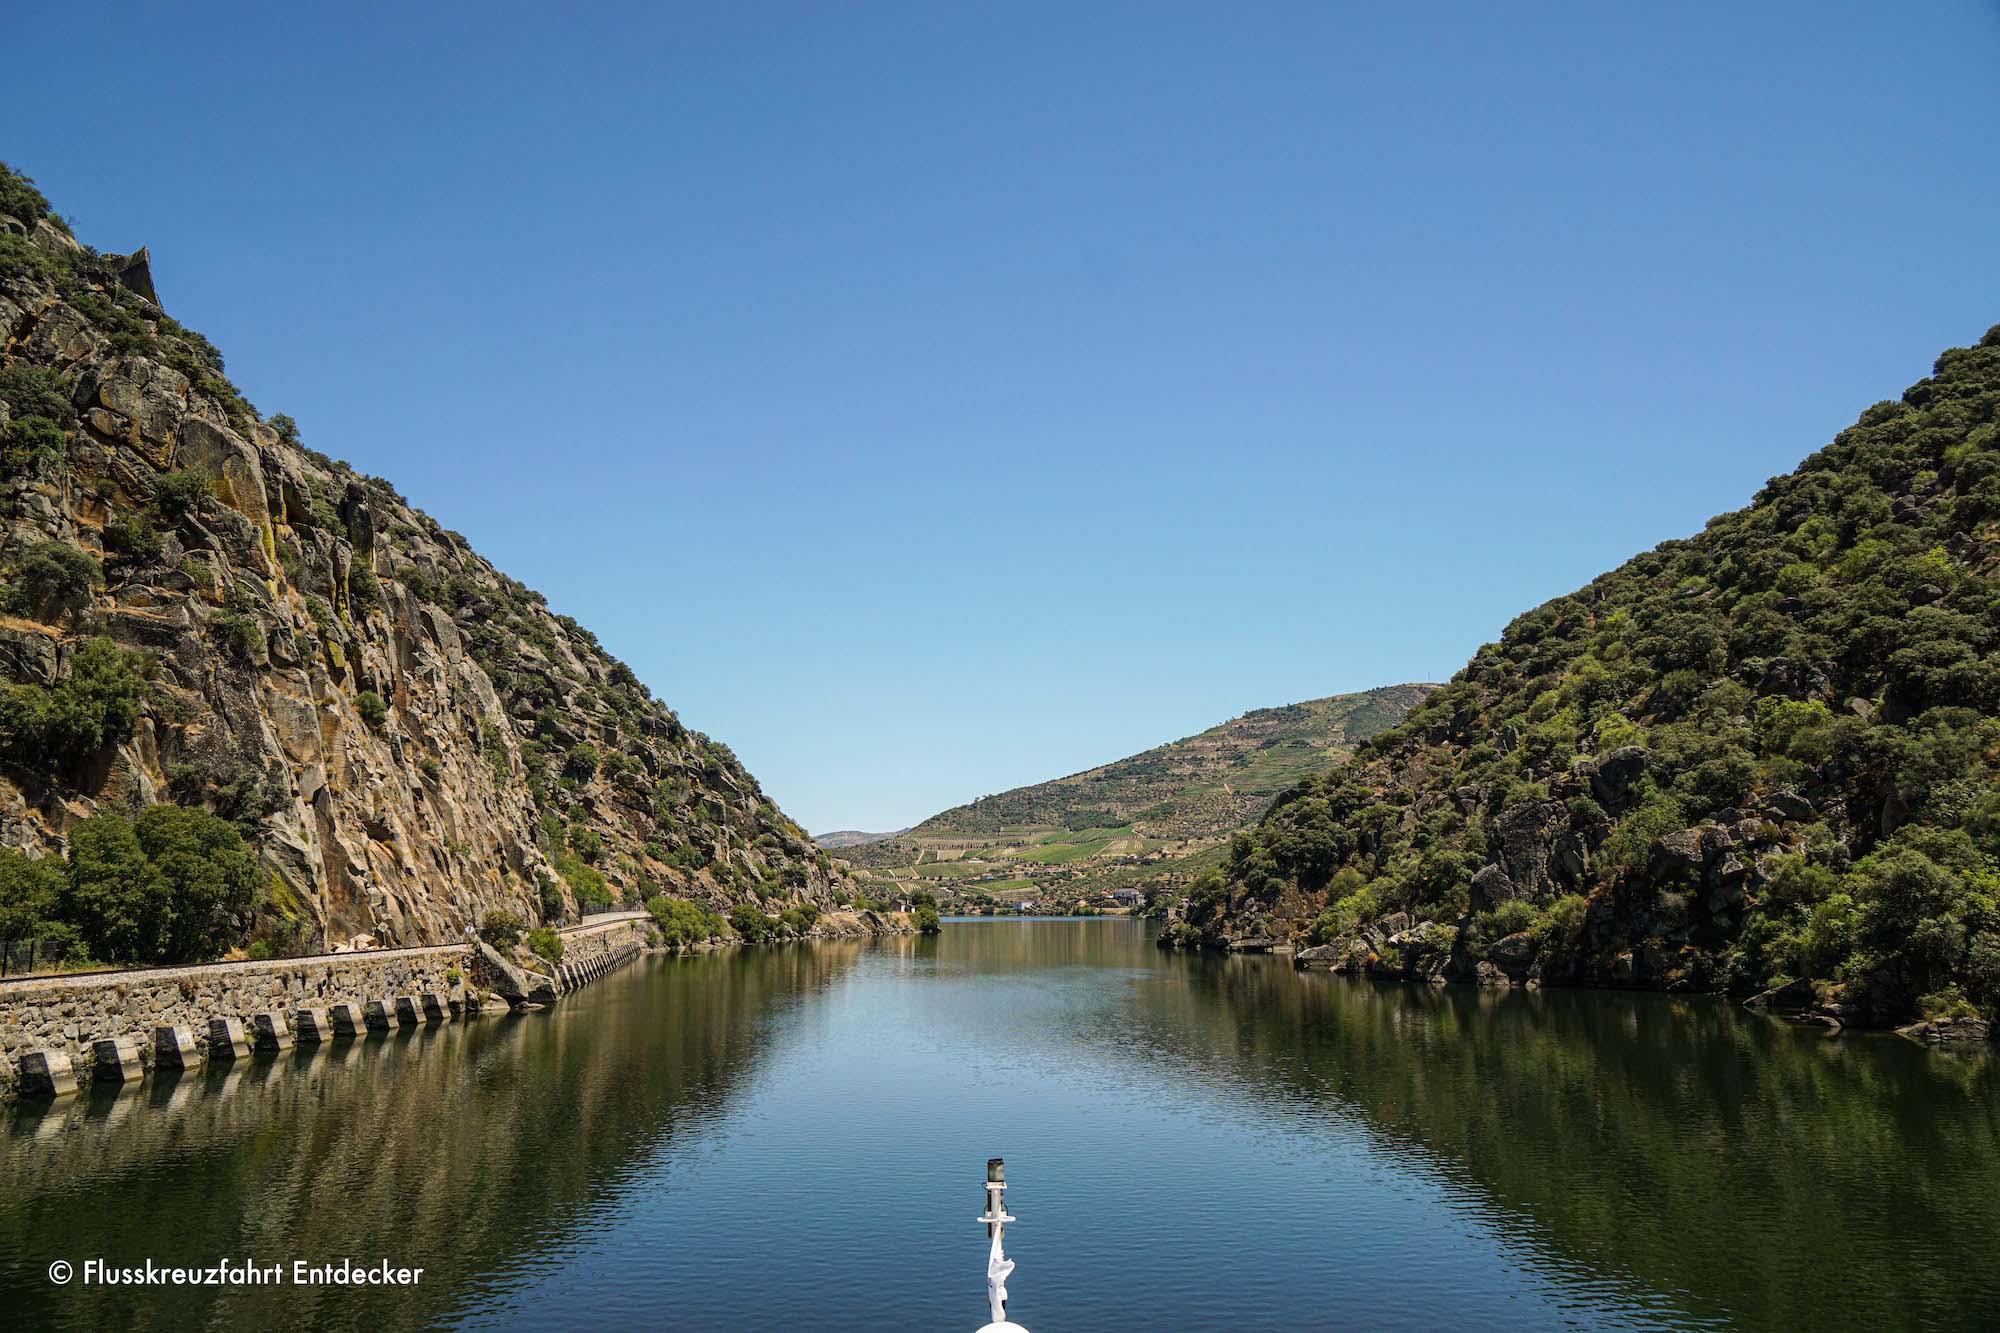 Flusskreuzfahrt-Veranstalter pausieren Douro-Saison